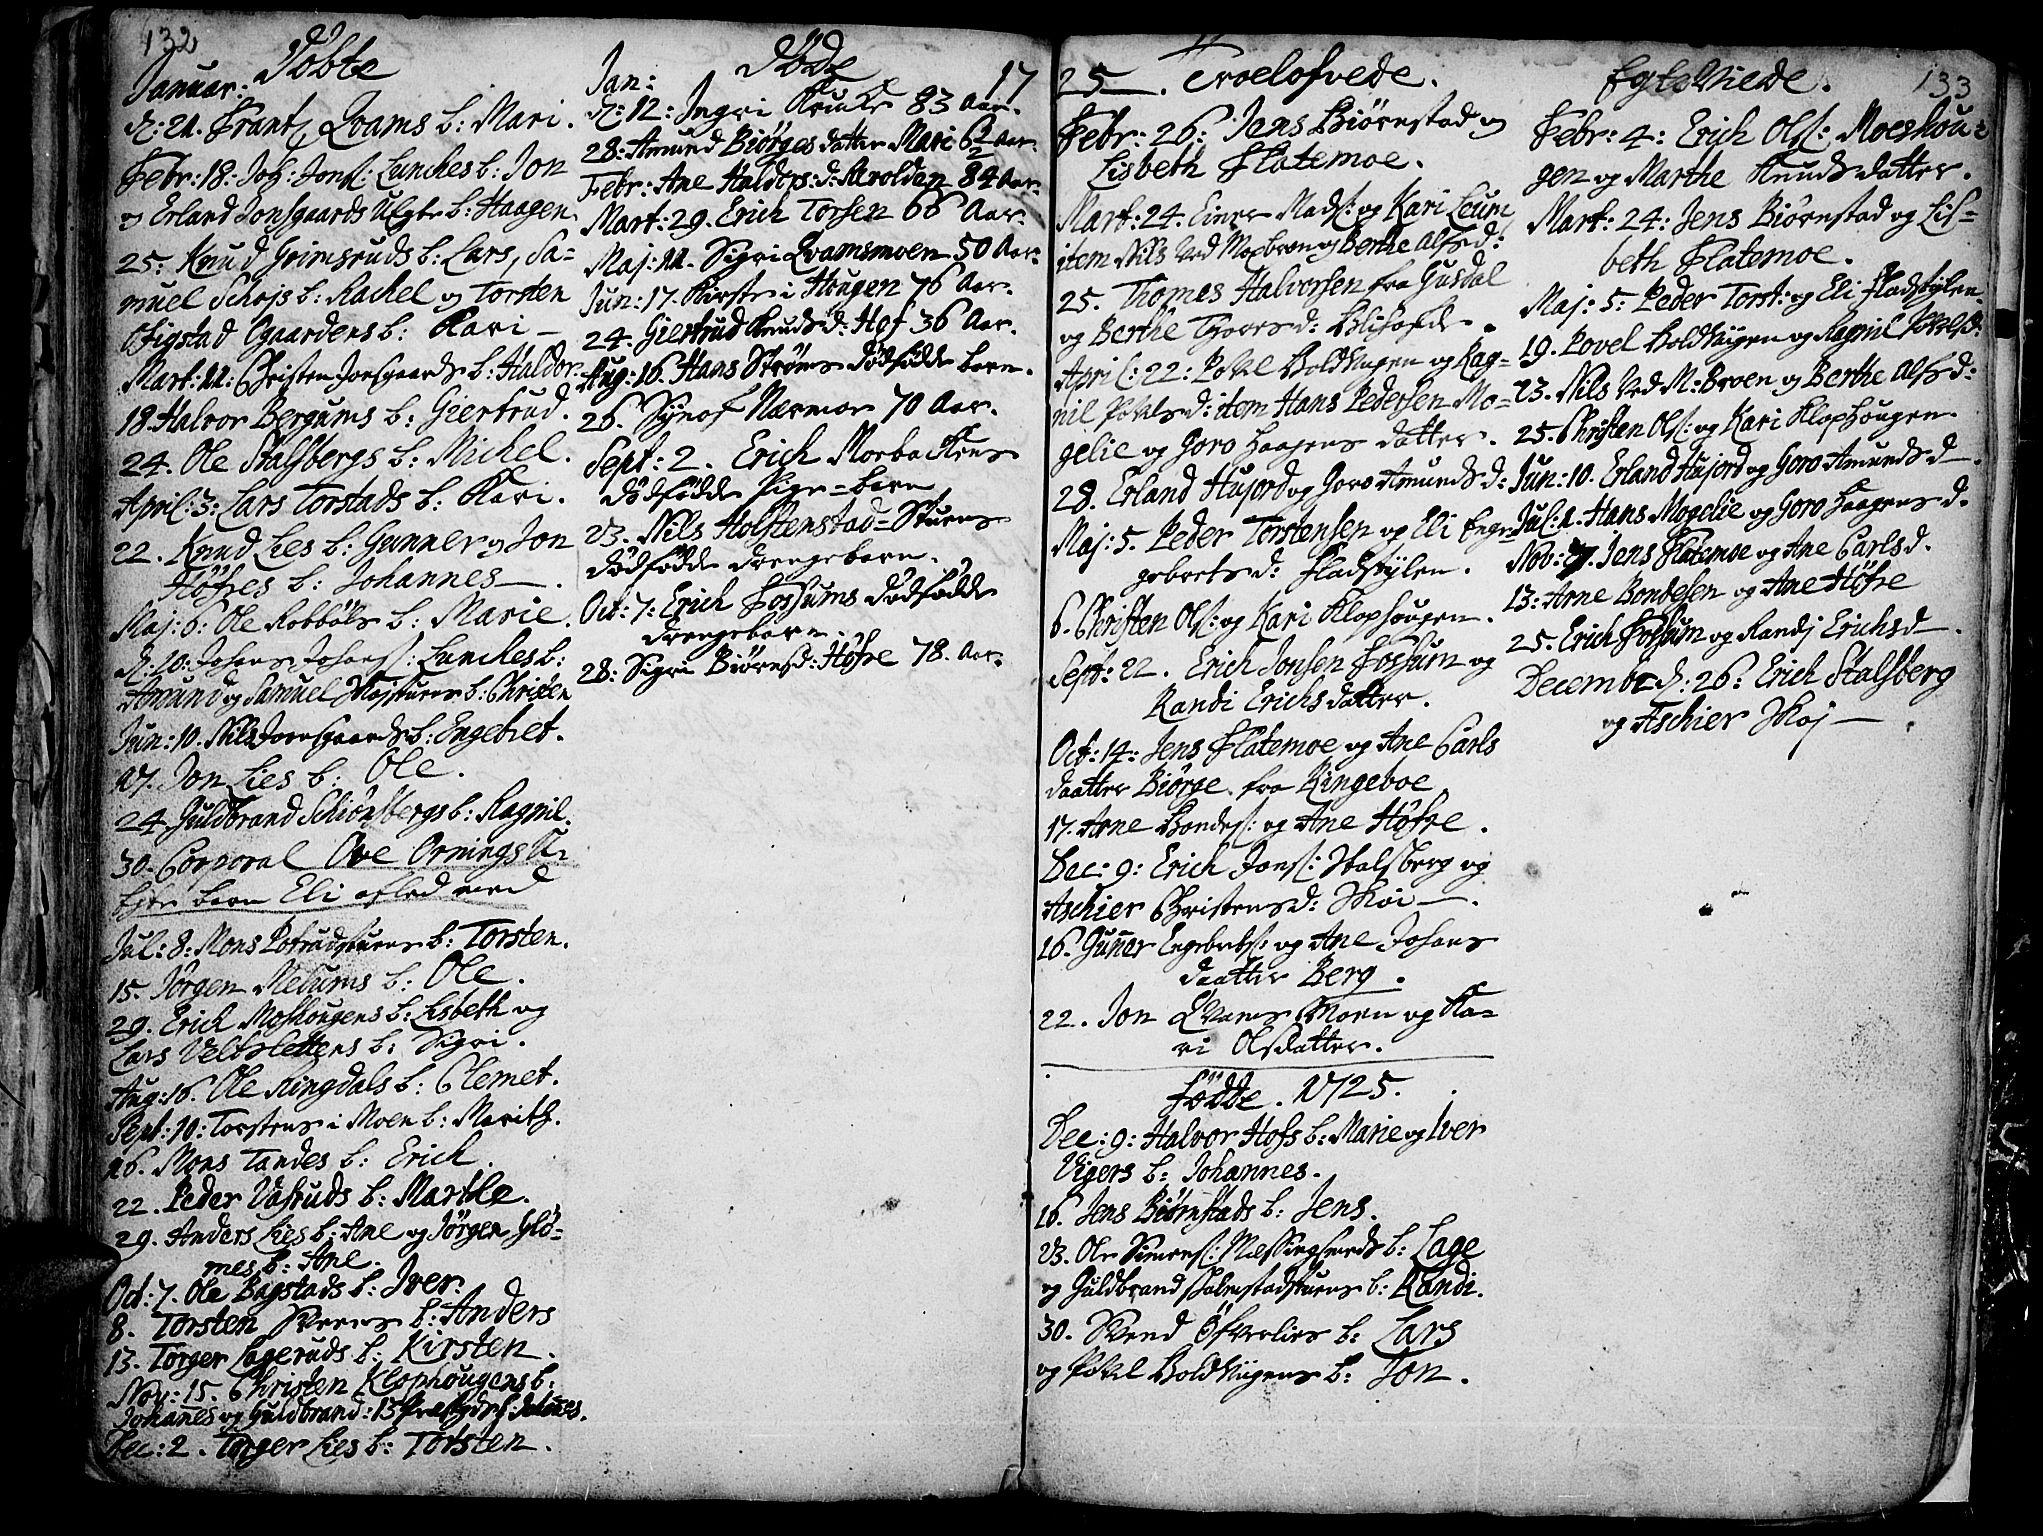 SAH, Øyer prestekontor, Ministerialbok nr. 1, 1671-1727, s. 132-133